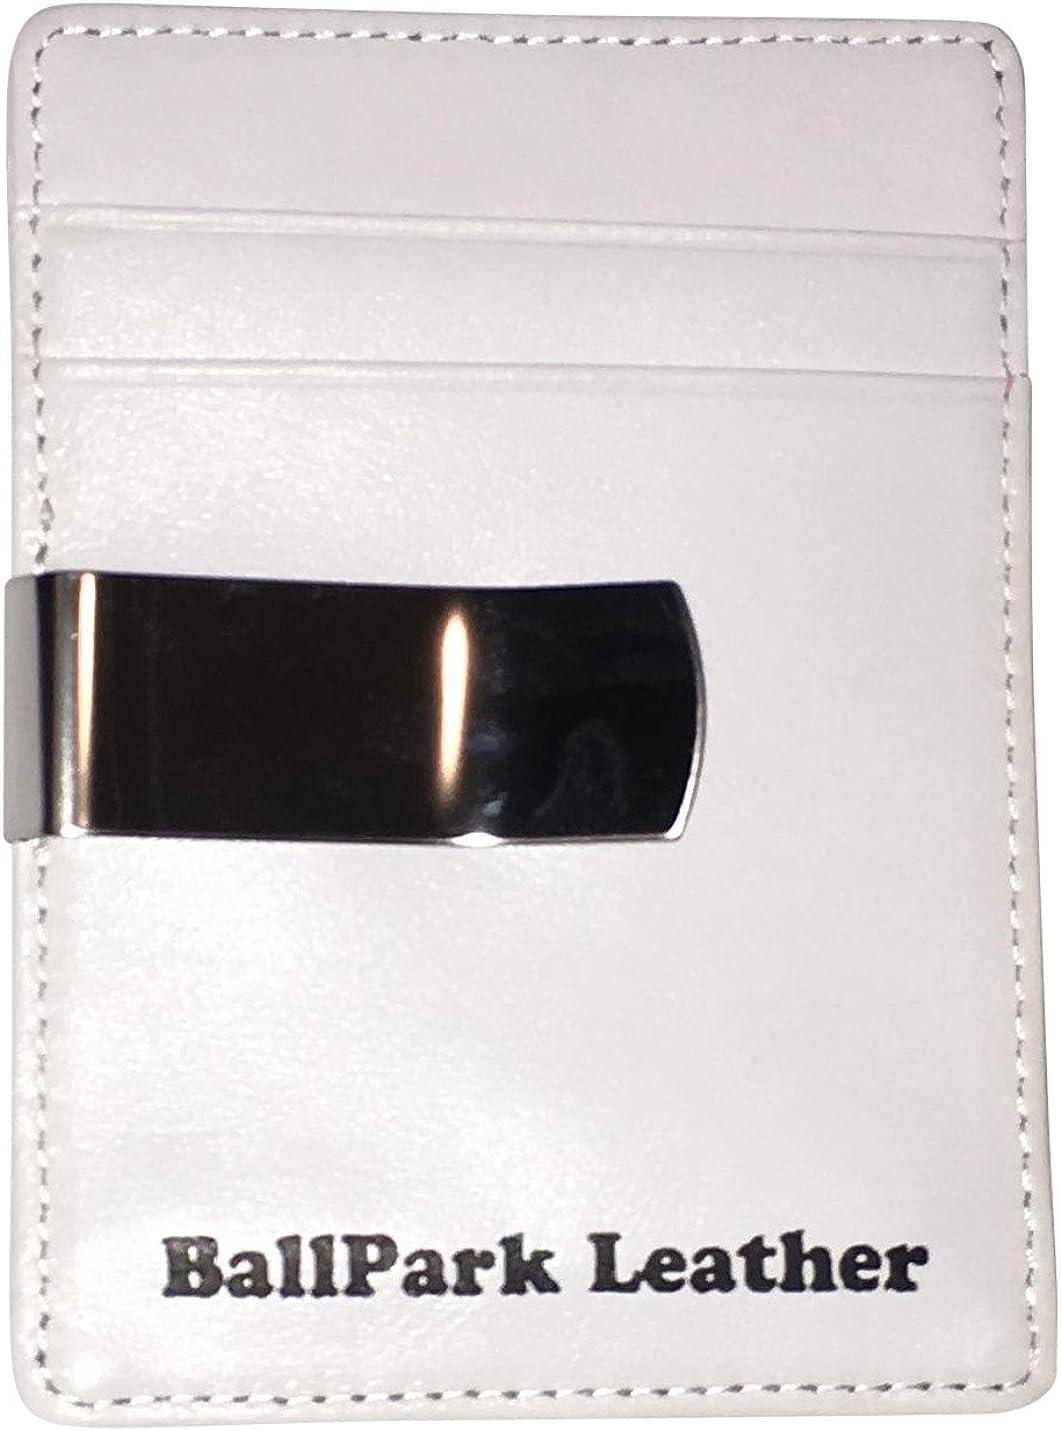 BallPark Leather White Leather Baseball Seam Money Clip Wallet